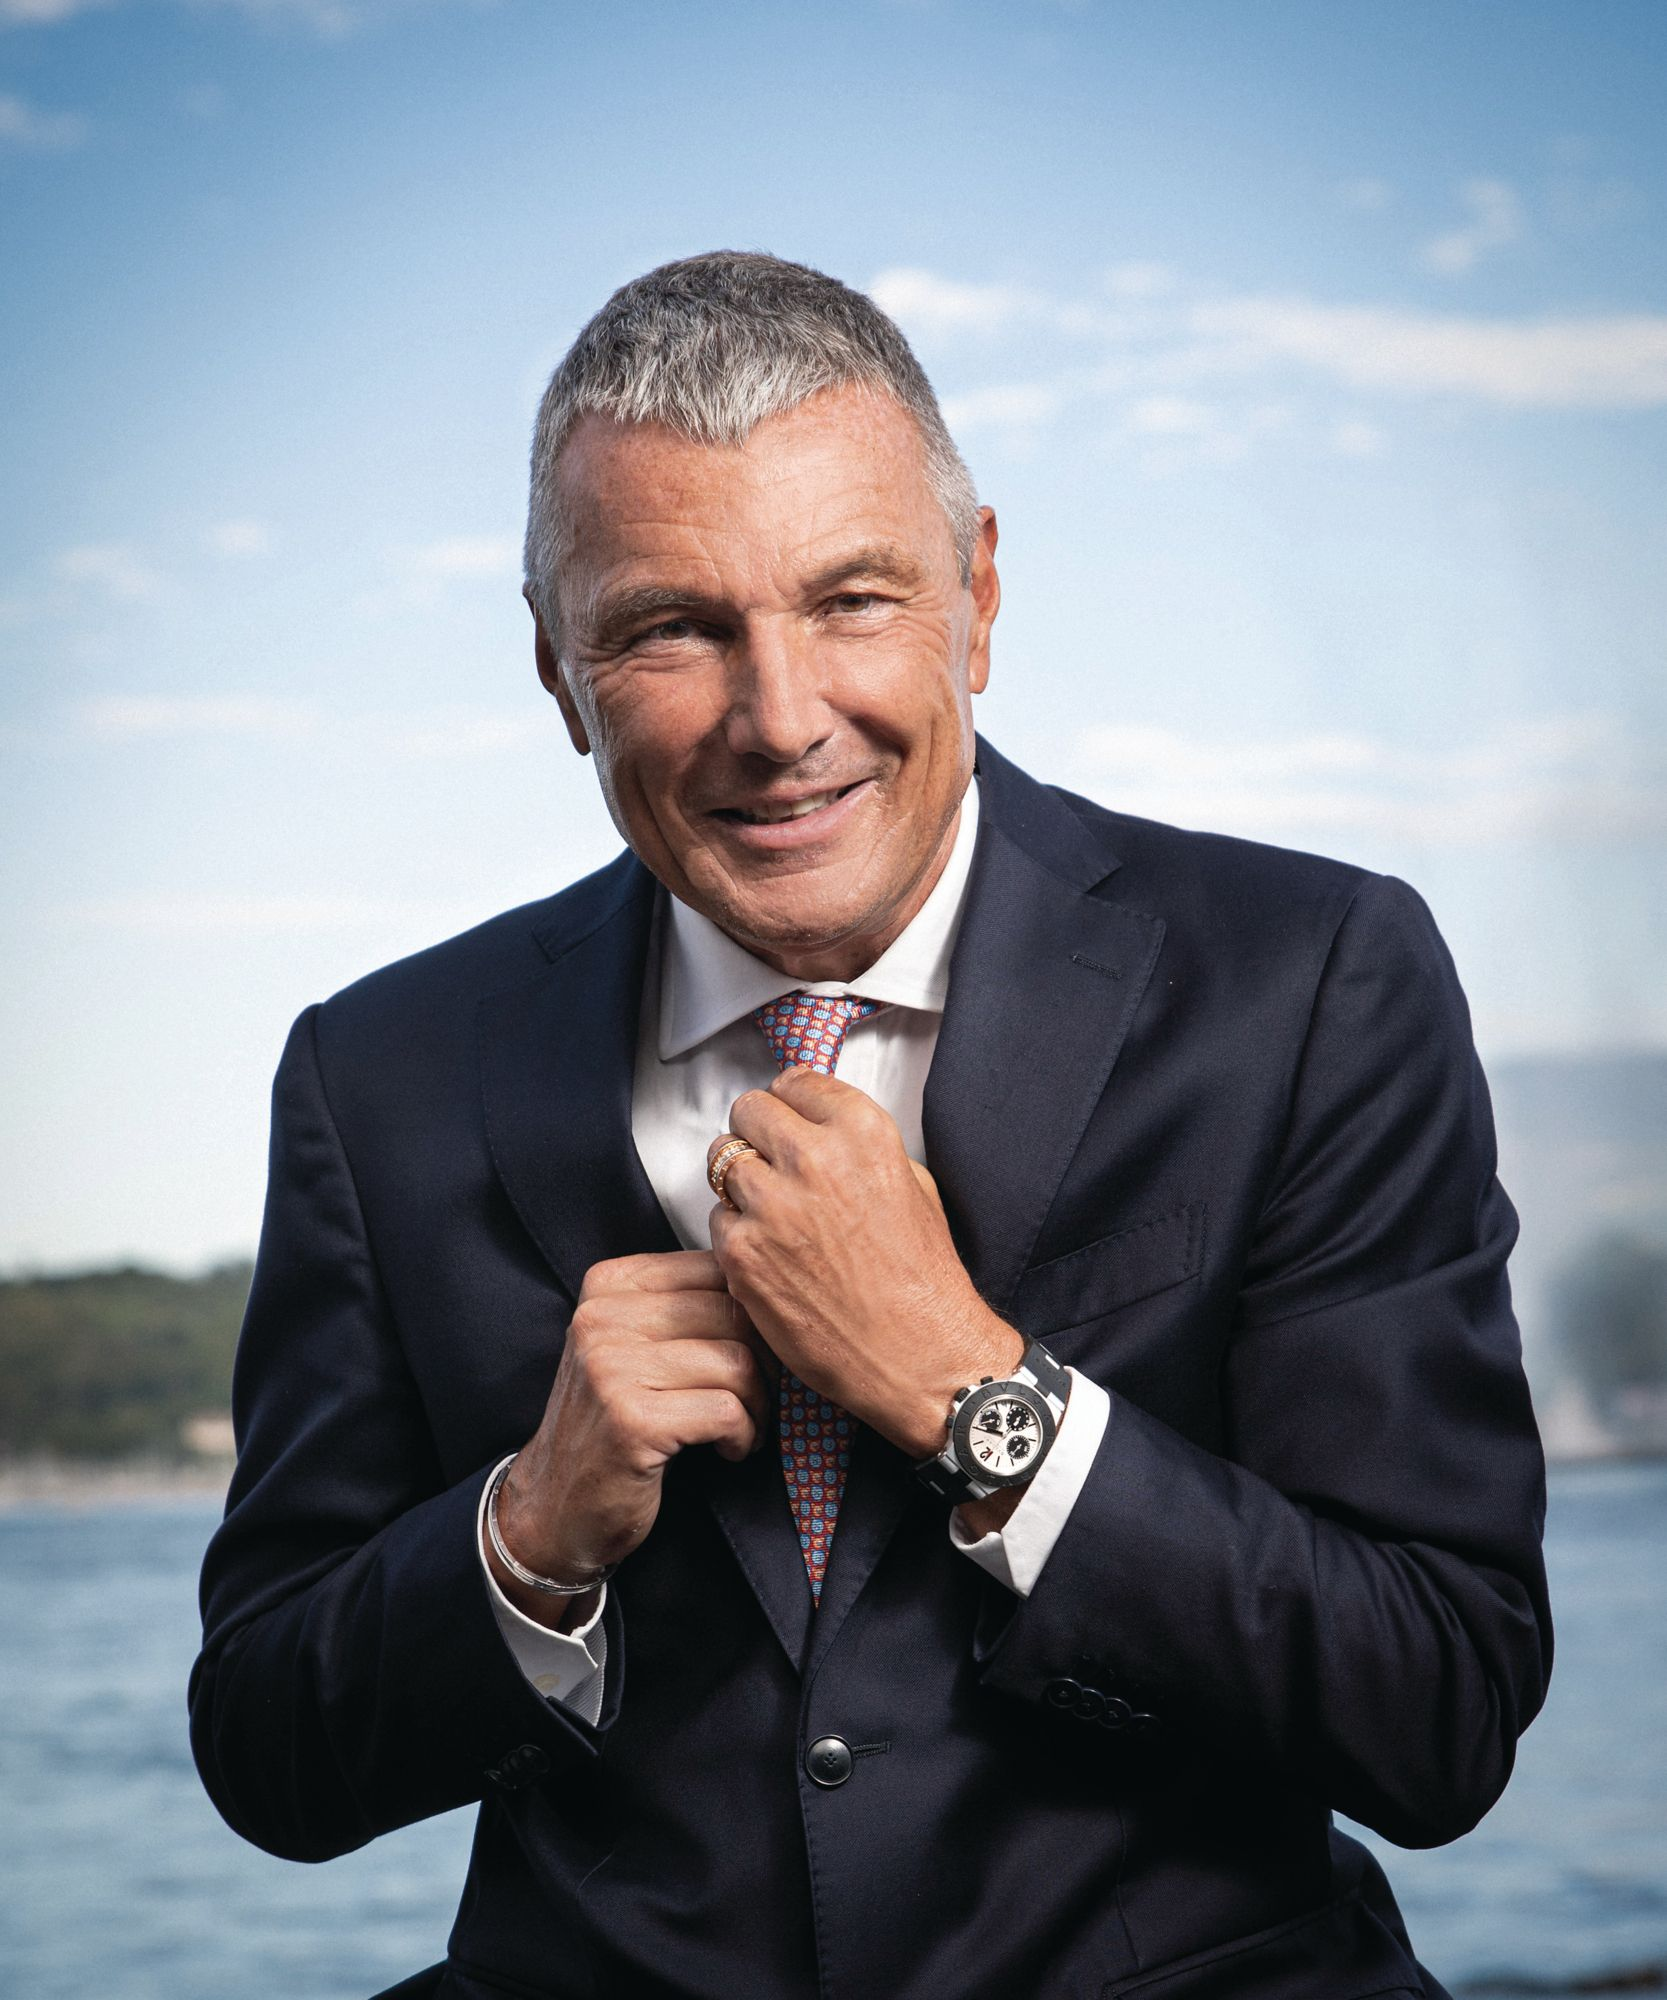 Bulgari's CEO, Jean-Christophe Babin on Geneva Watch Days